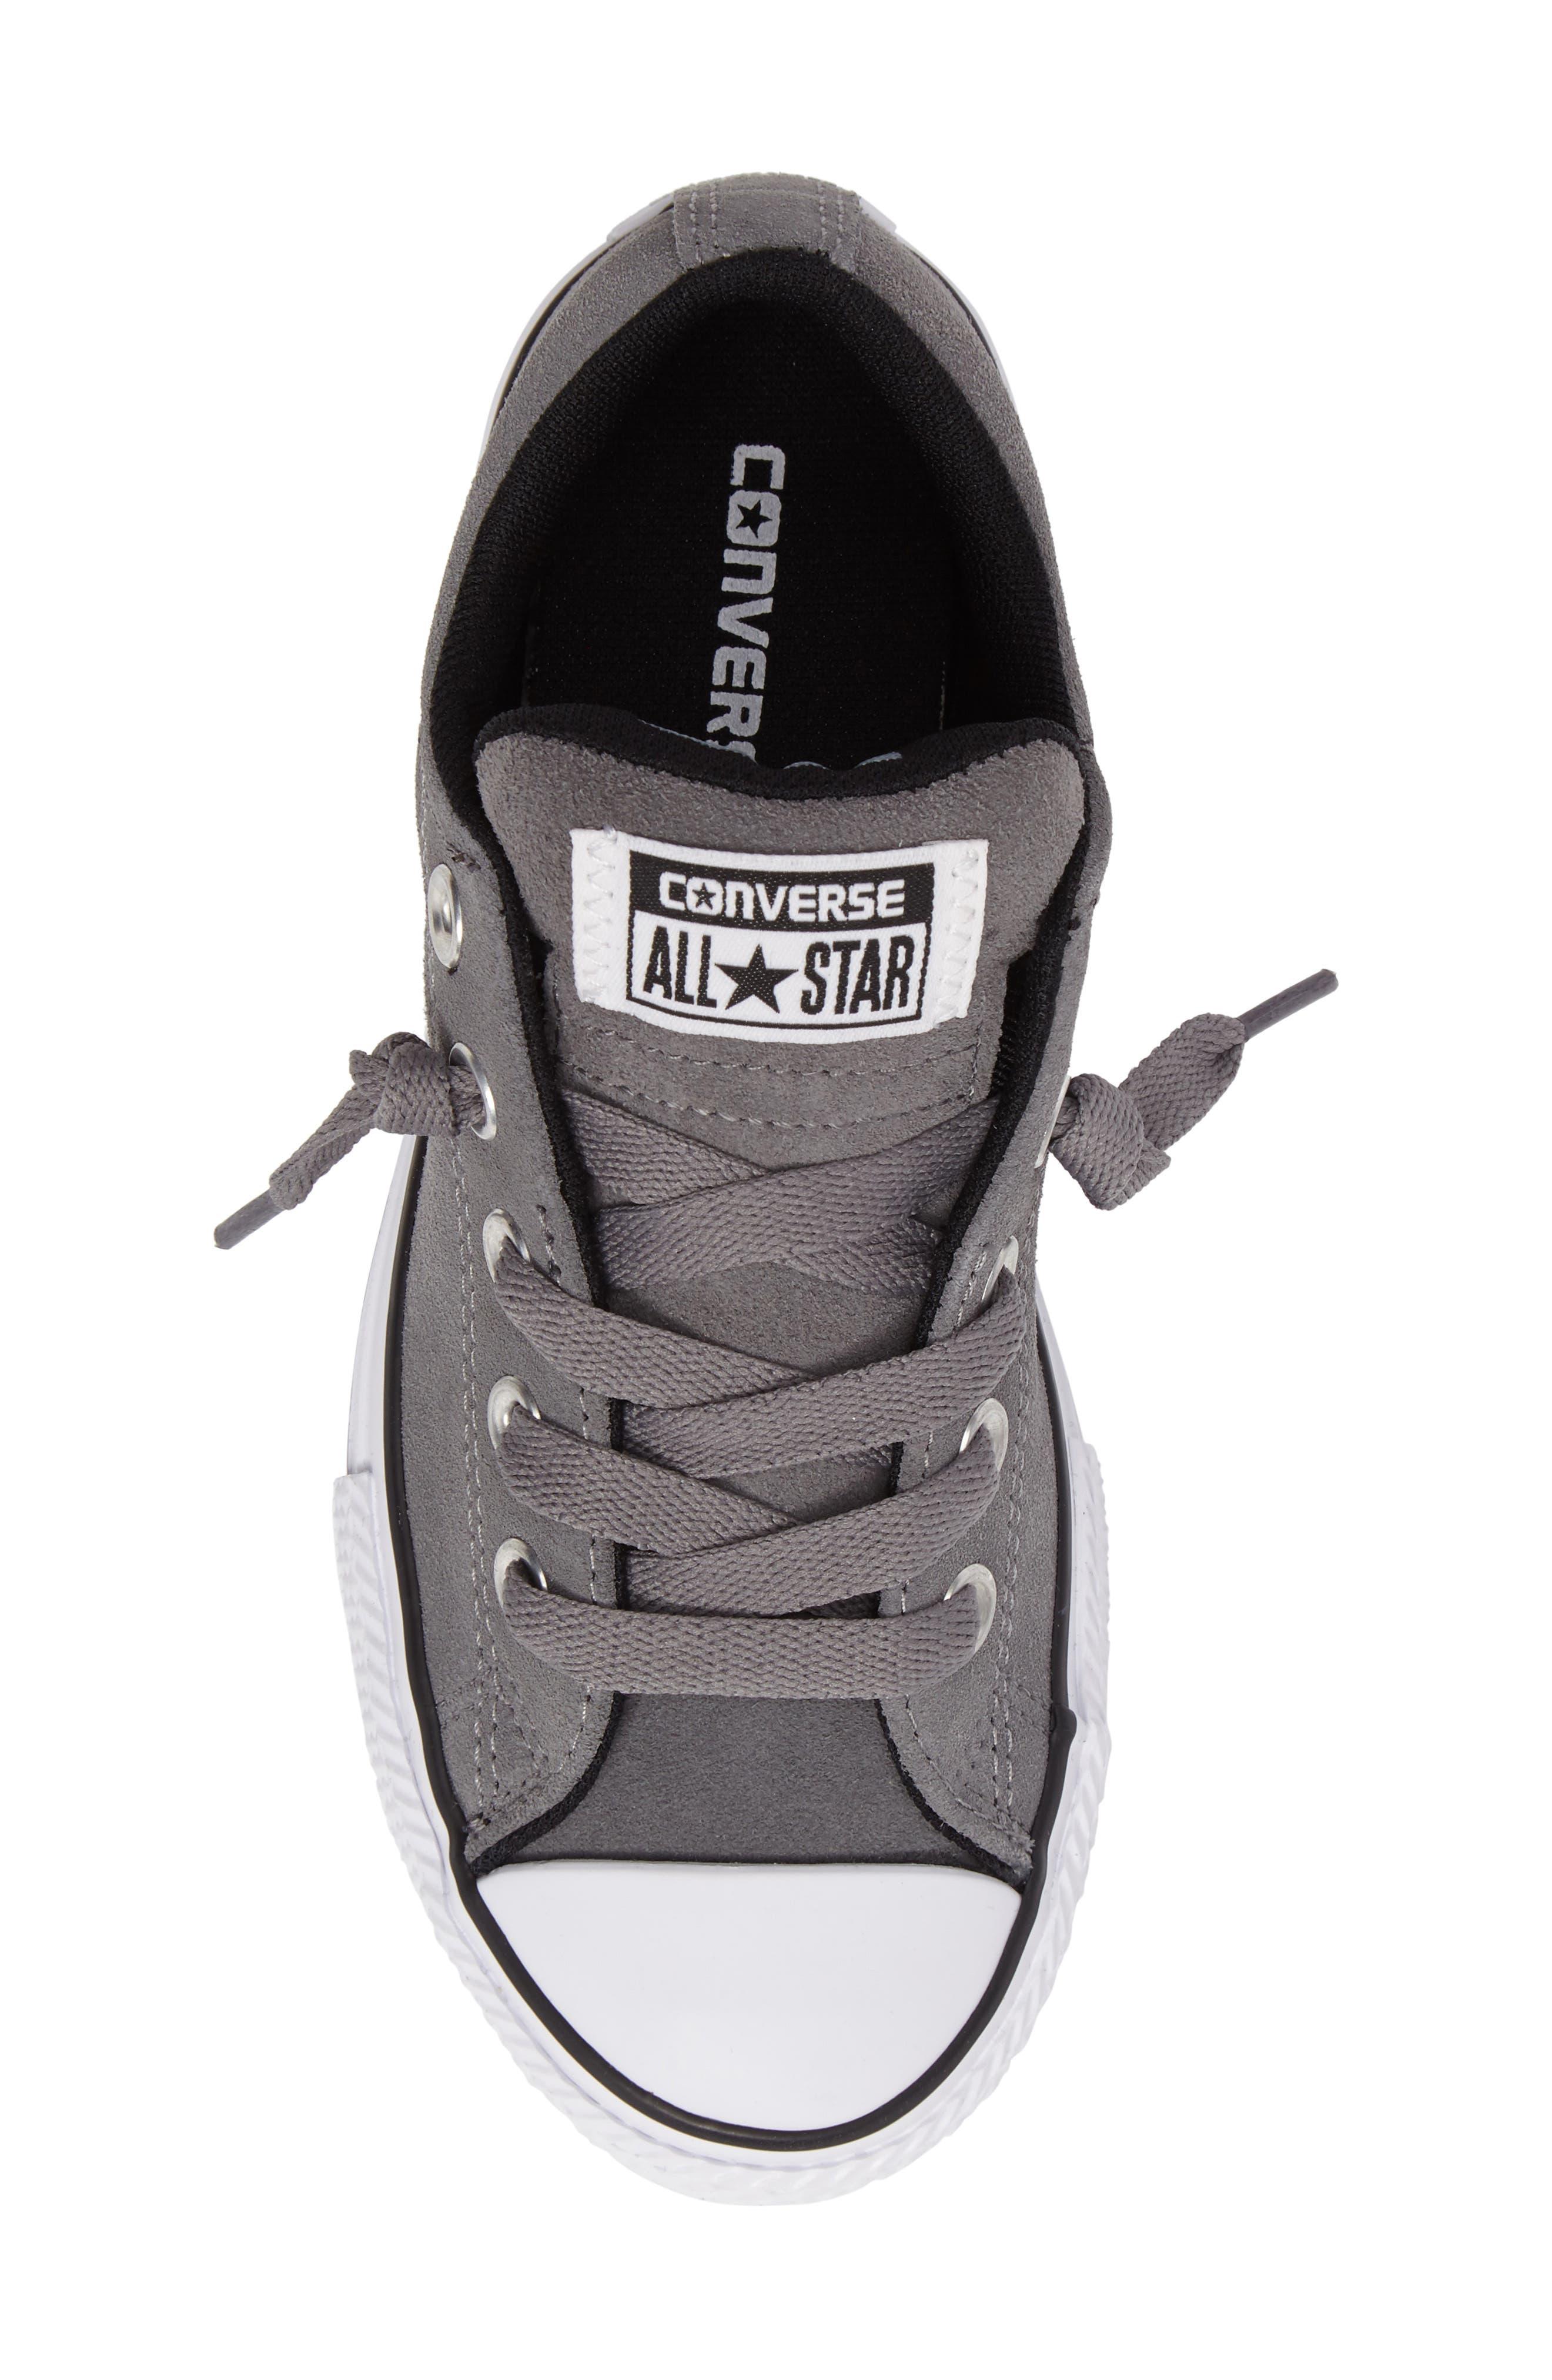 Chuck Taylor<sup>®</sup> All Star<sup>®</sup> Street Sneaker,                             Alternate thumbnail 5, color,                             Mason/ Black/ White